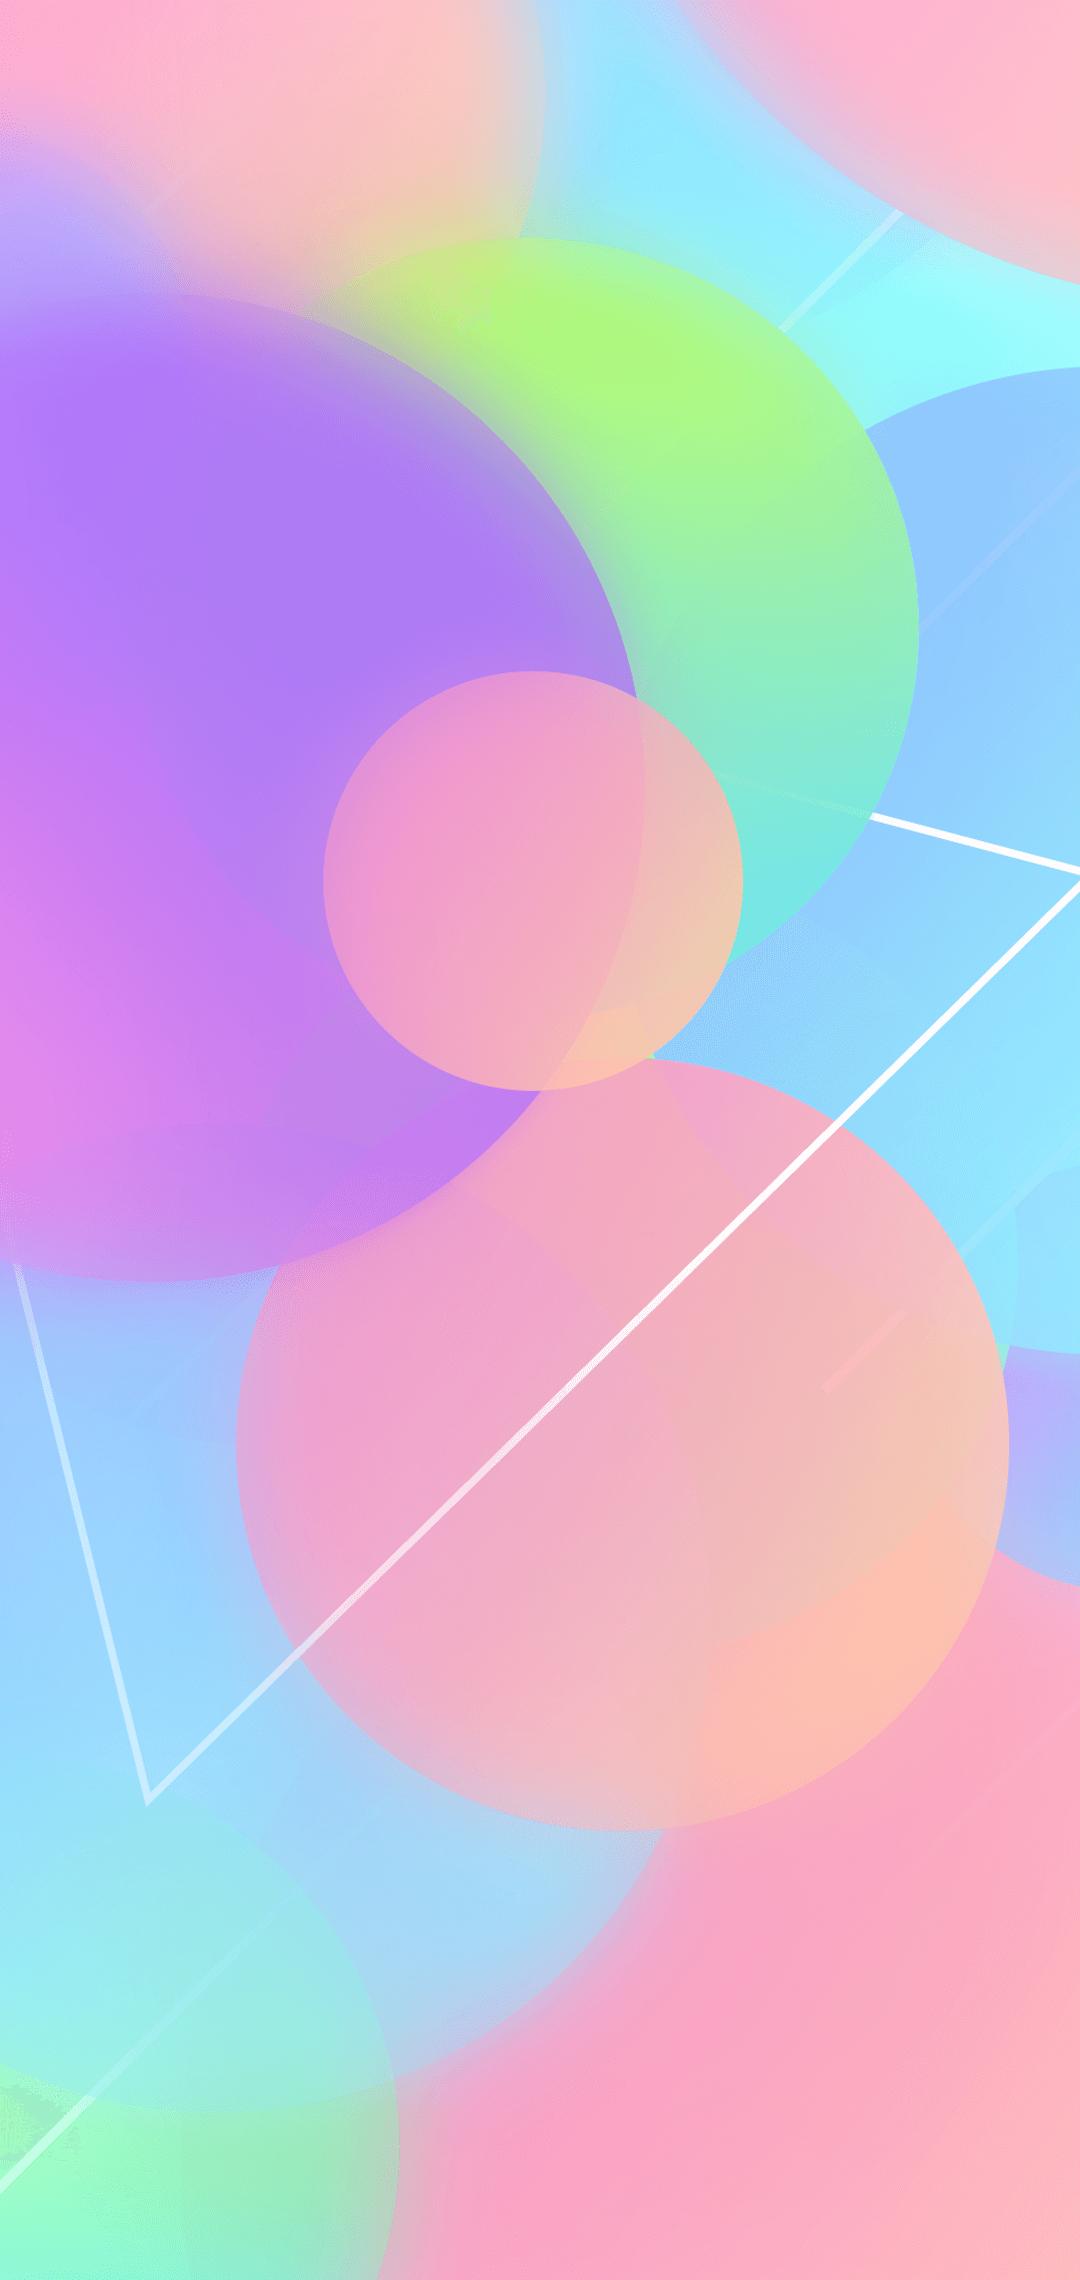 redmi-note-7-wall-05